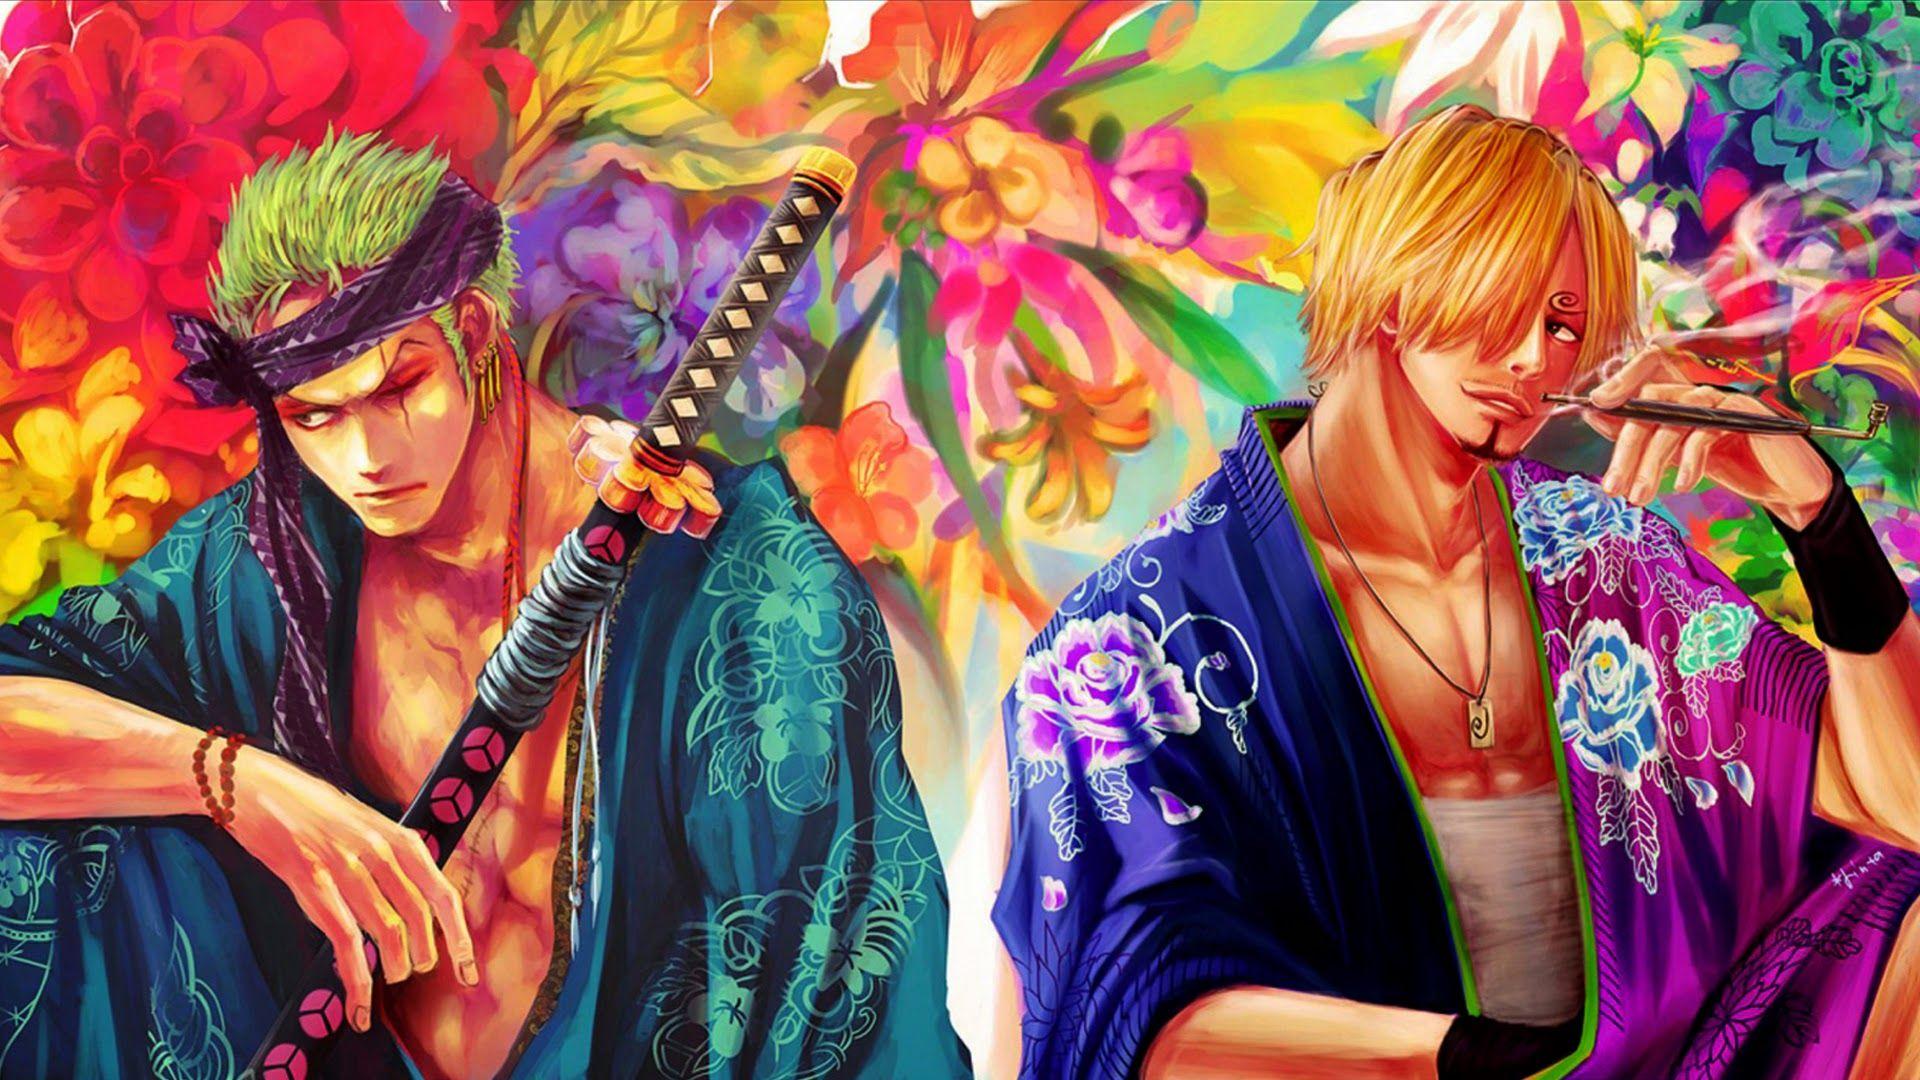 Roronoa Zoro And Sanji Kimono One Piece Anime Image